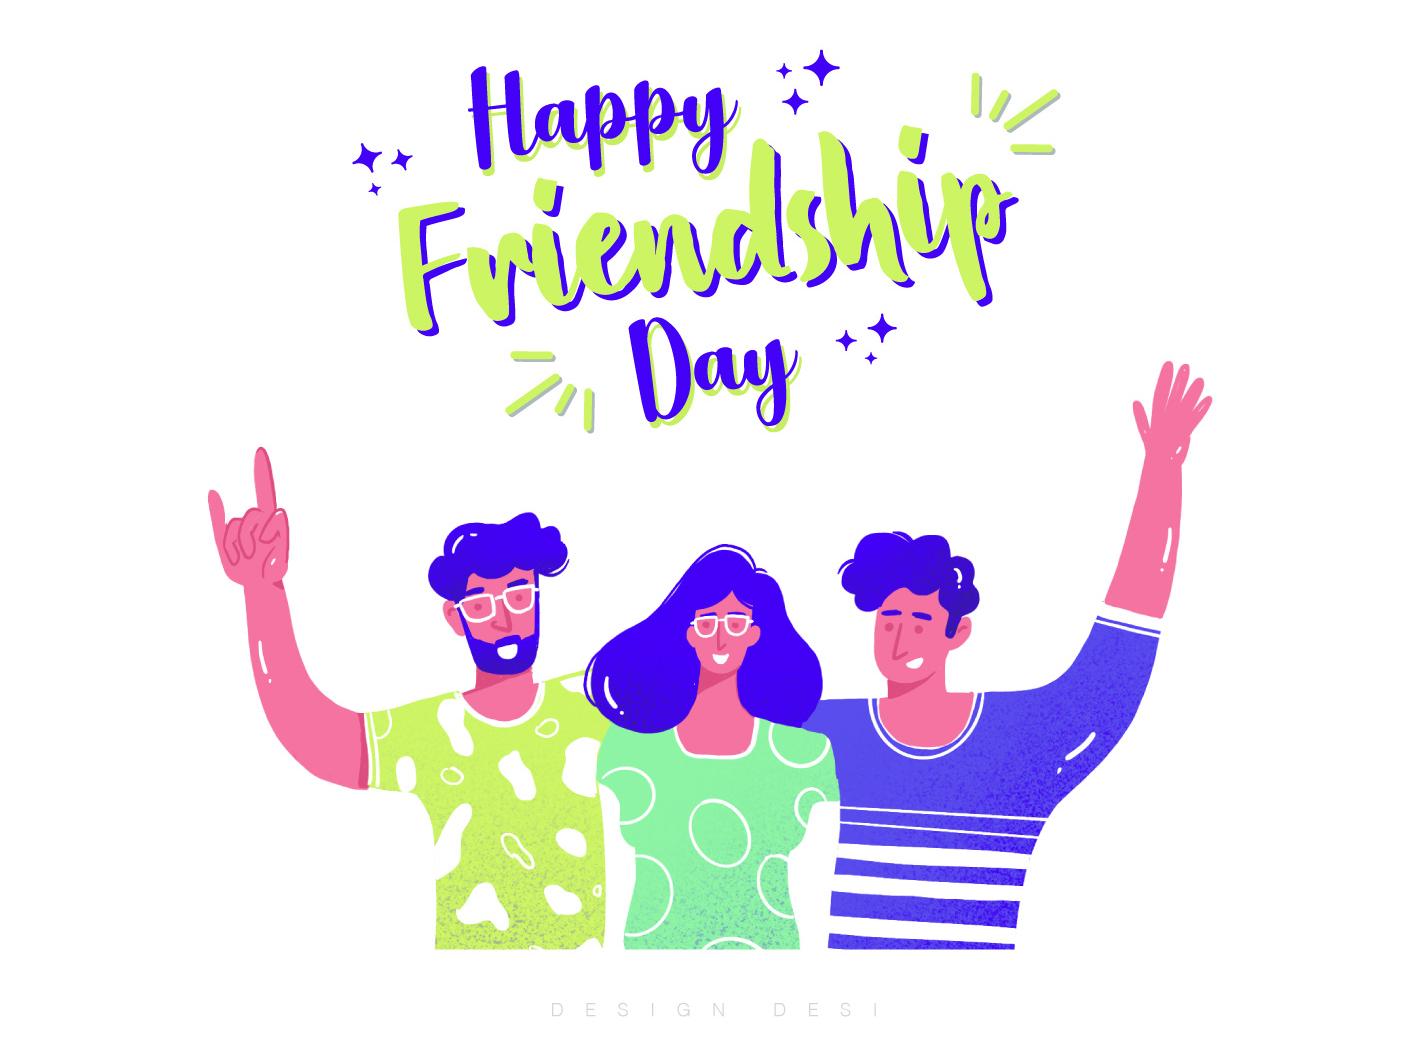 Happy Friendship Day love minimal ios web icon mobile uiux website graphic design artwork illustrator adobe illustrator flat animation typography motion graphics friendship vector illustration design